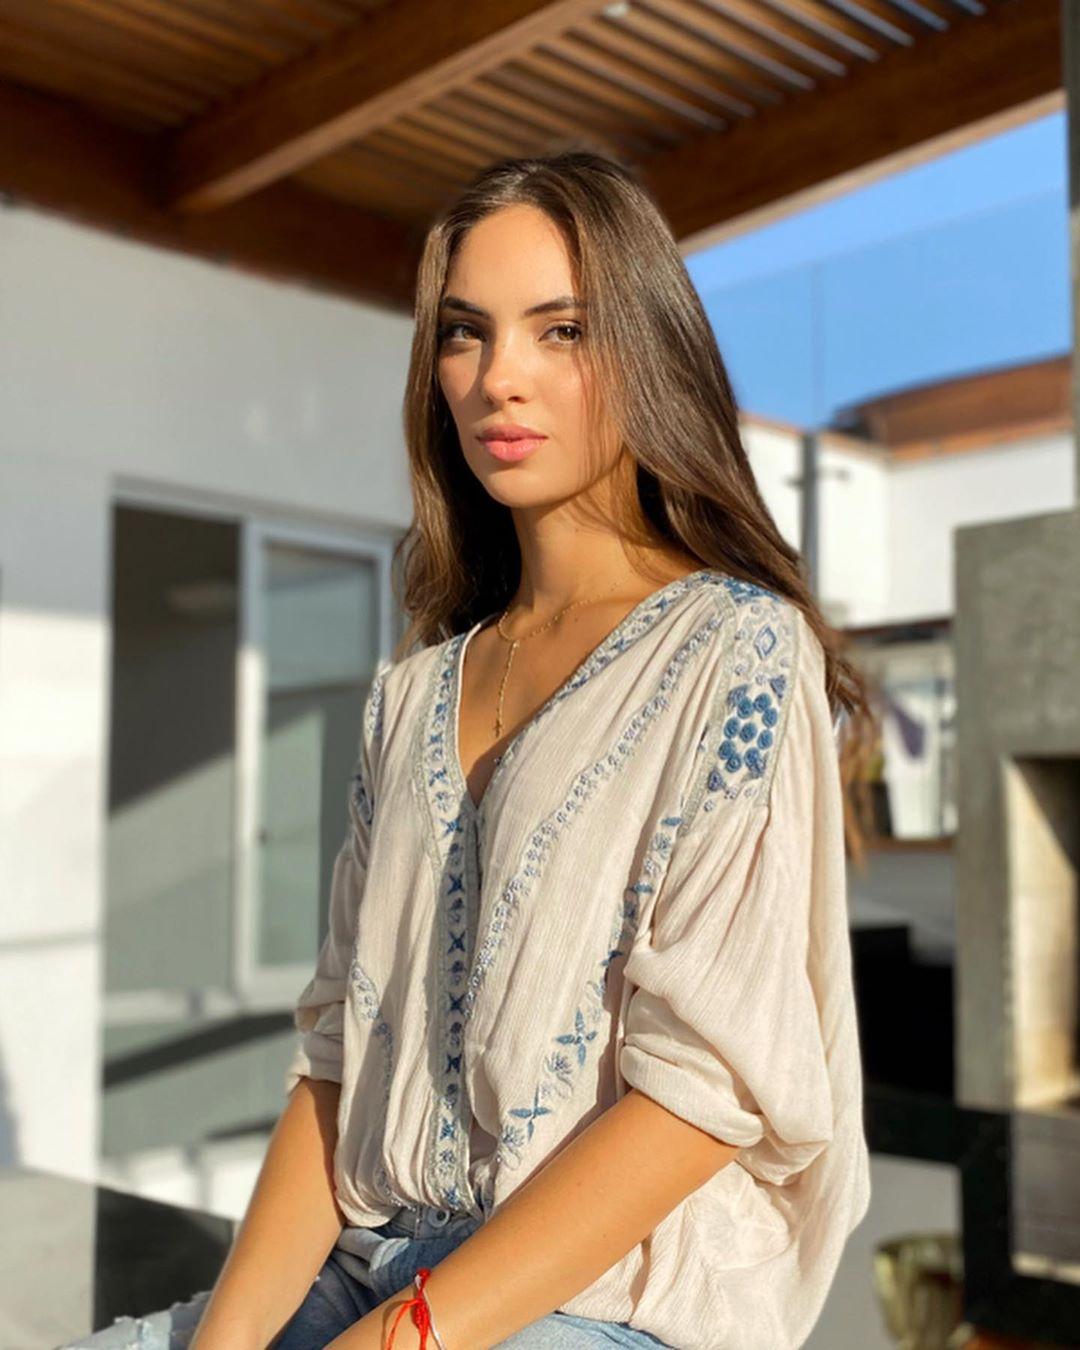 natalie vertiz, miss peru universe 2011. particpo de nb latina 2010 & latin model 2010 (season 3). - Página 16 94420510